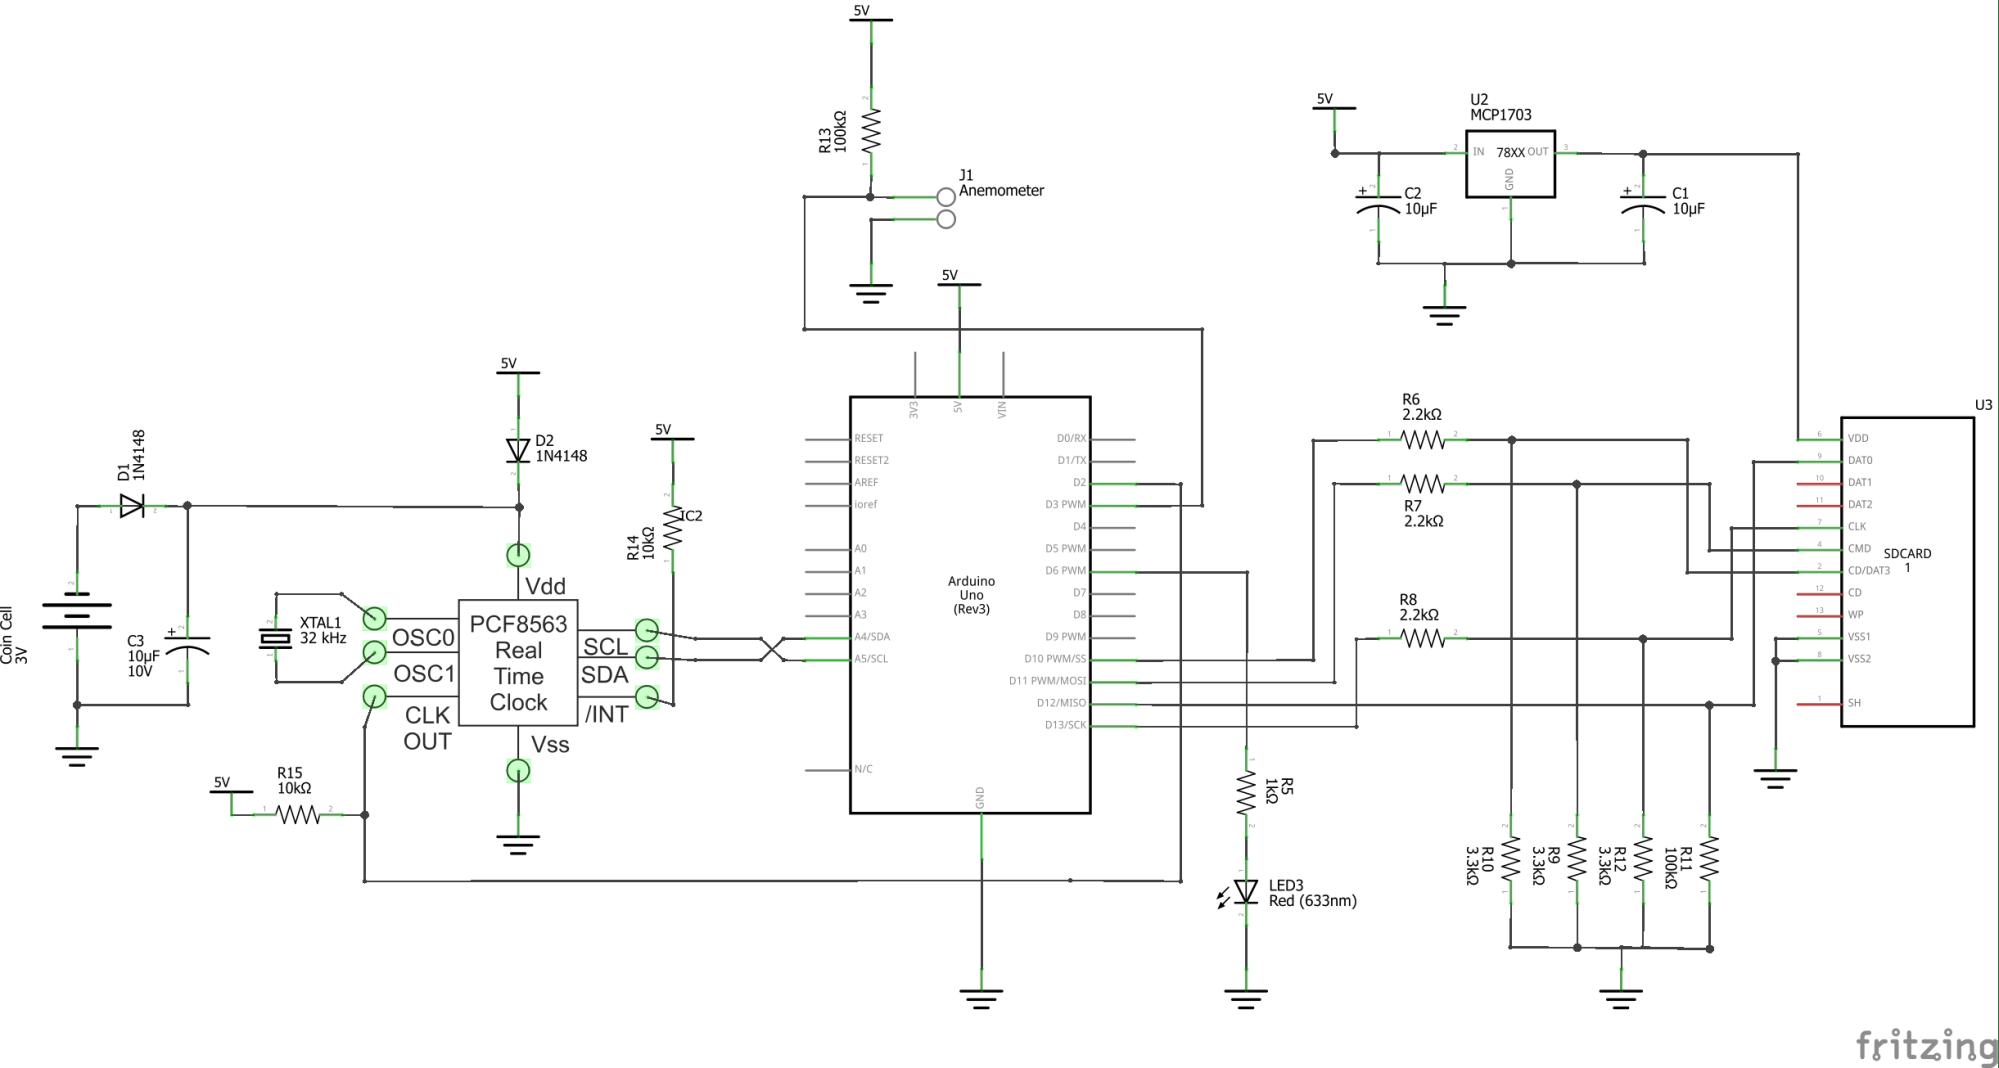 hight resolution of small wind turbine wiring schematic wiring library rh 10 skriptoase de small wind turbine wiring diagram small wind turbine wiring diagram